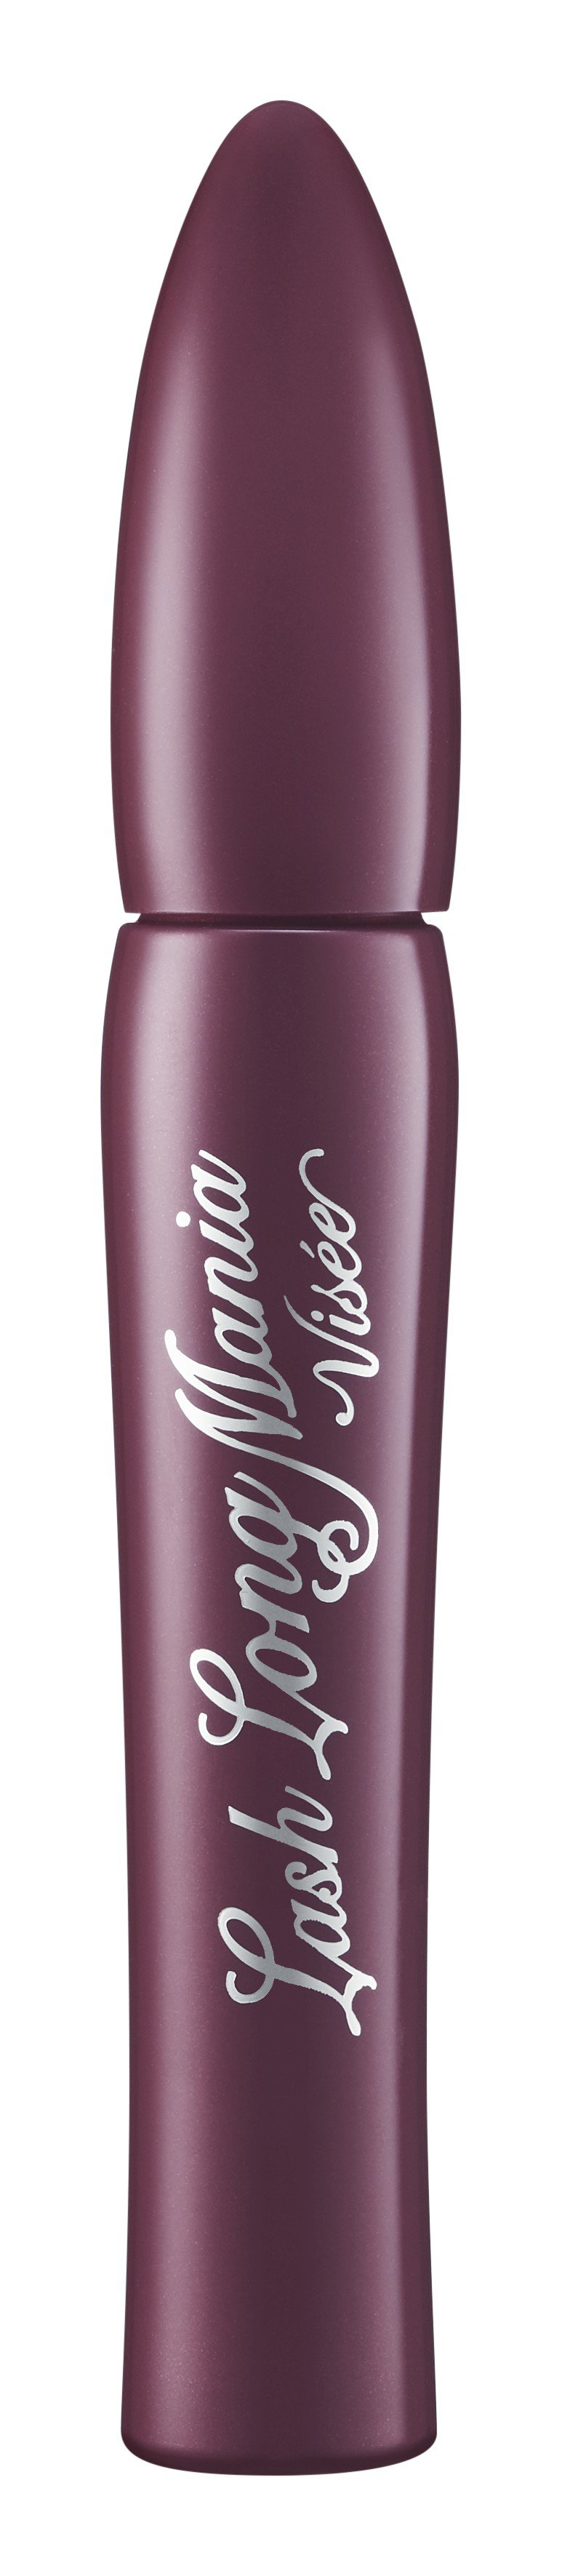 Visee酒紅纖羽長睫膏#RD401酒紅寶石,售價370元,9月1日上市。圖/V...